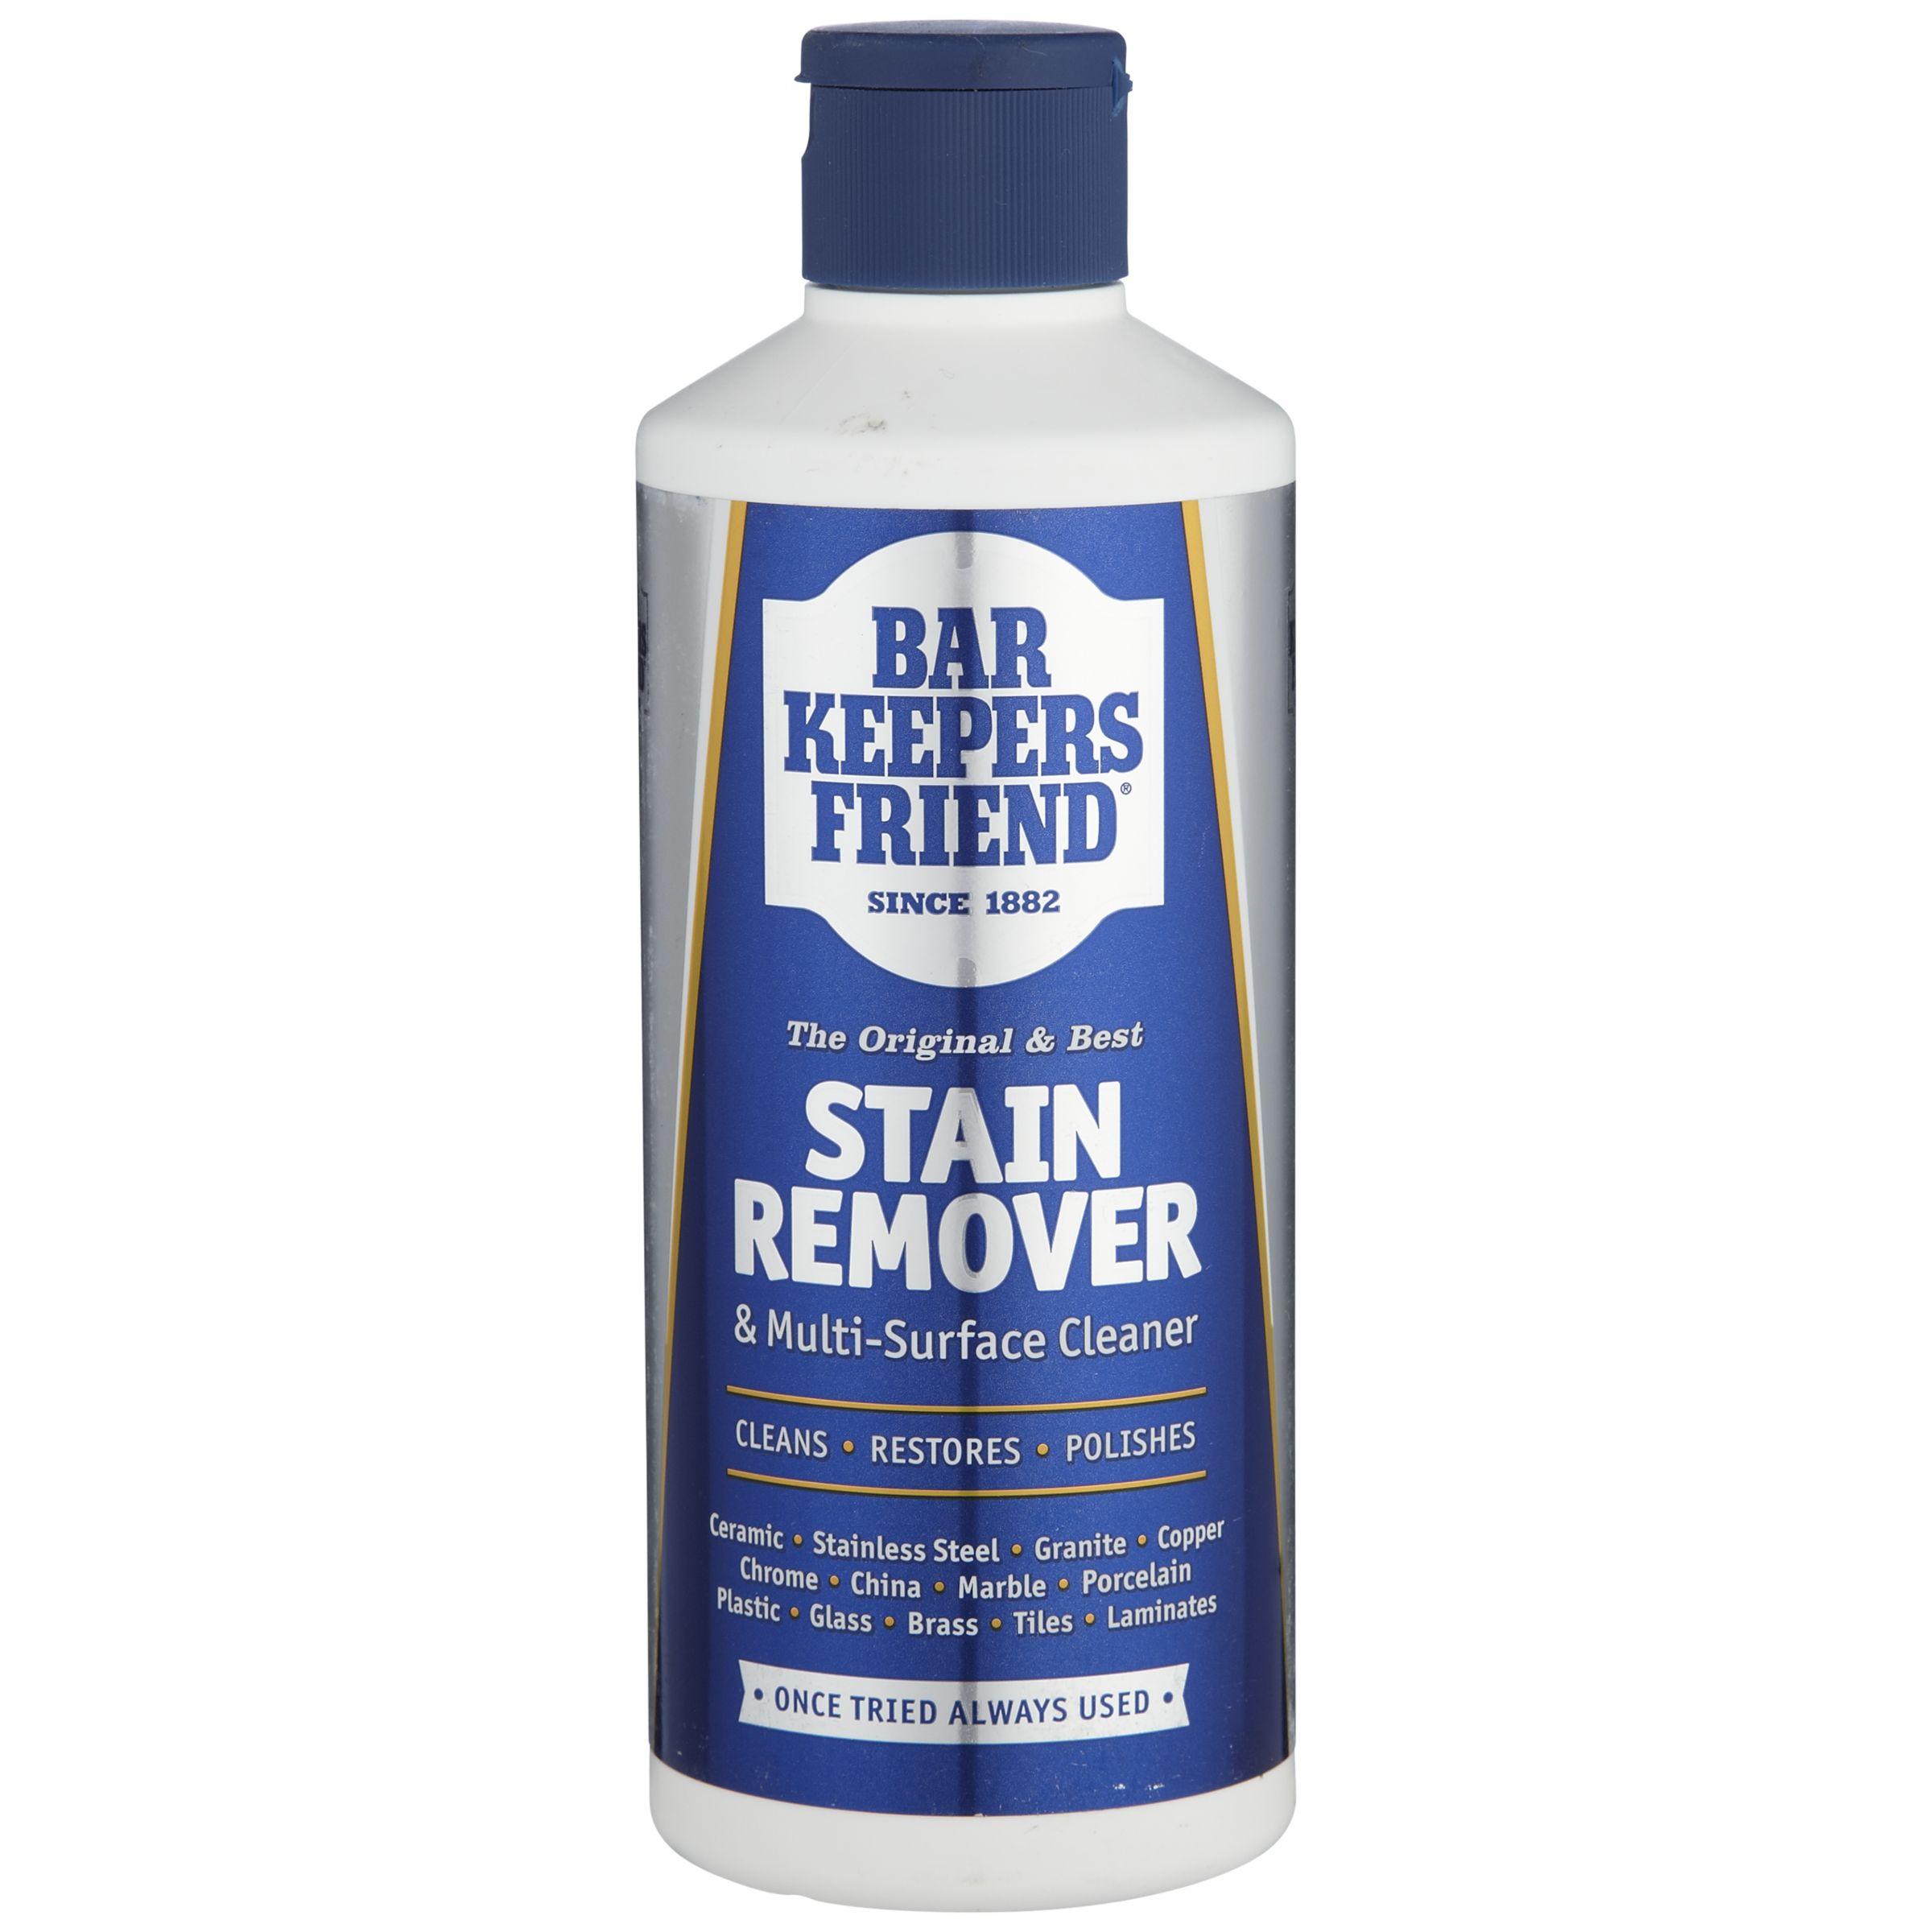 Bar Keeper's Friend Bar Keepers Friend Original Cleaning Powder, 250g